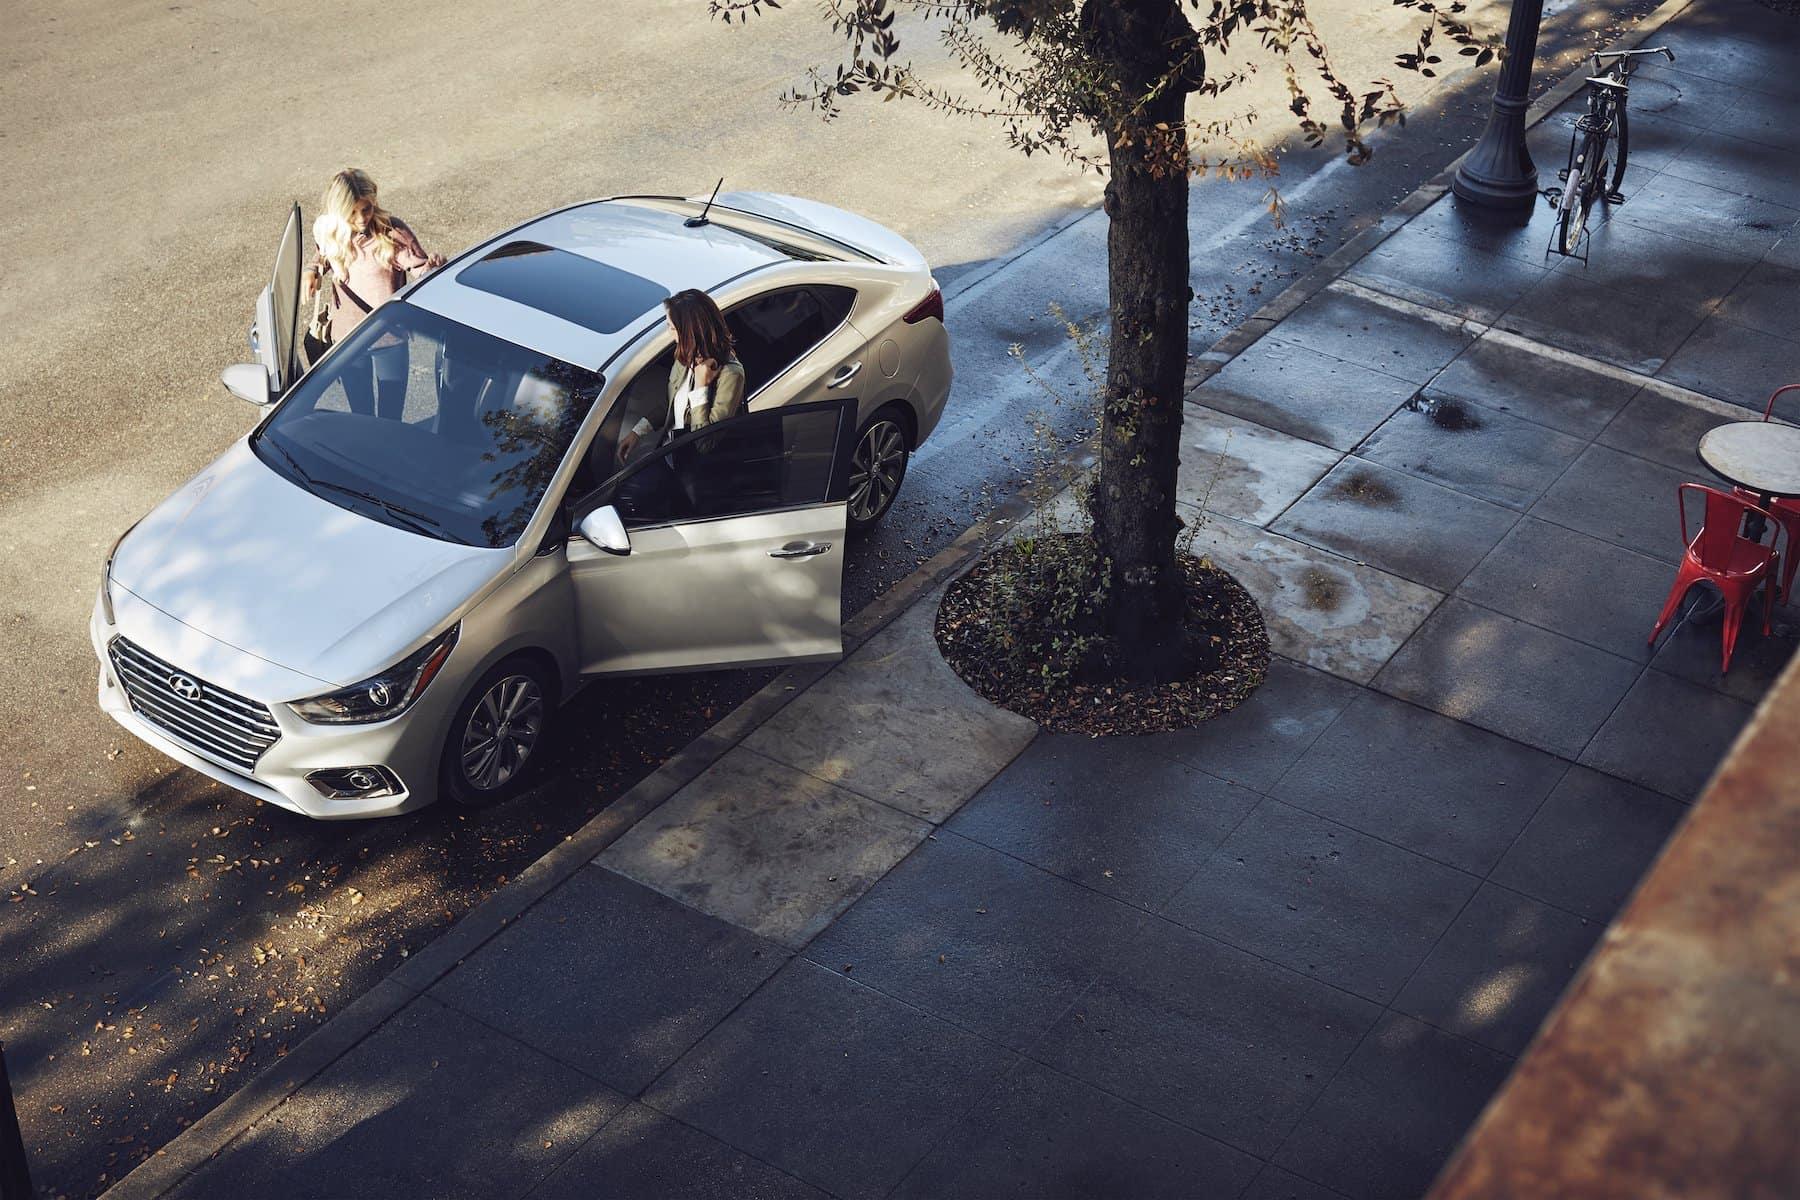 Washington Hyundai is a Hyundai Dealership in Washington near McGovern, PA | People getting out of 2020 Hyundai Accent on sidewalk